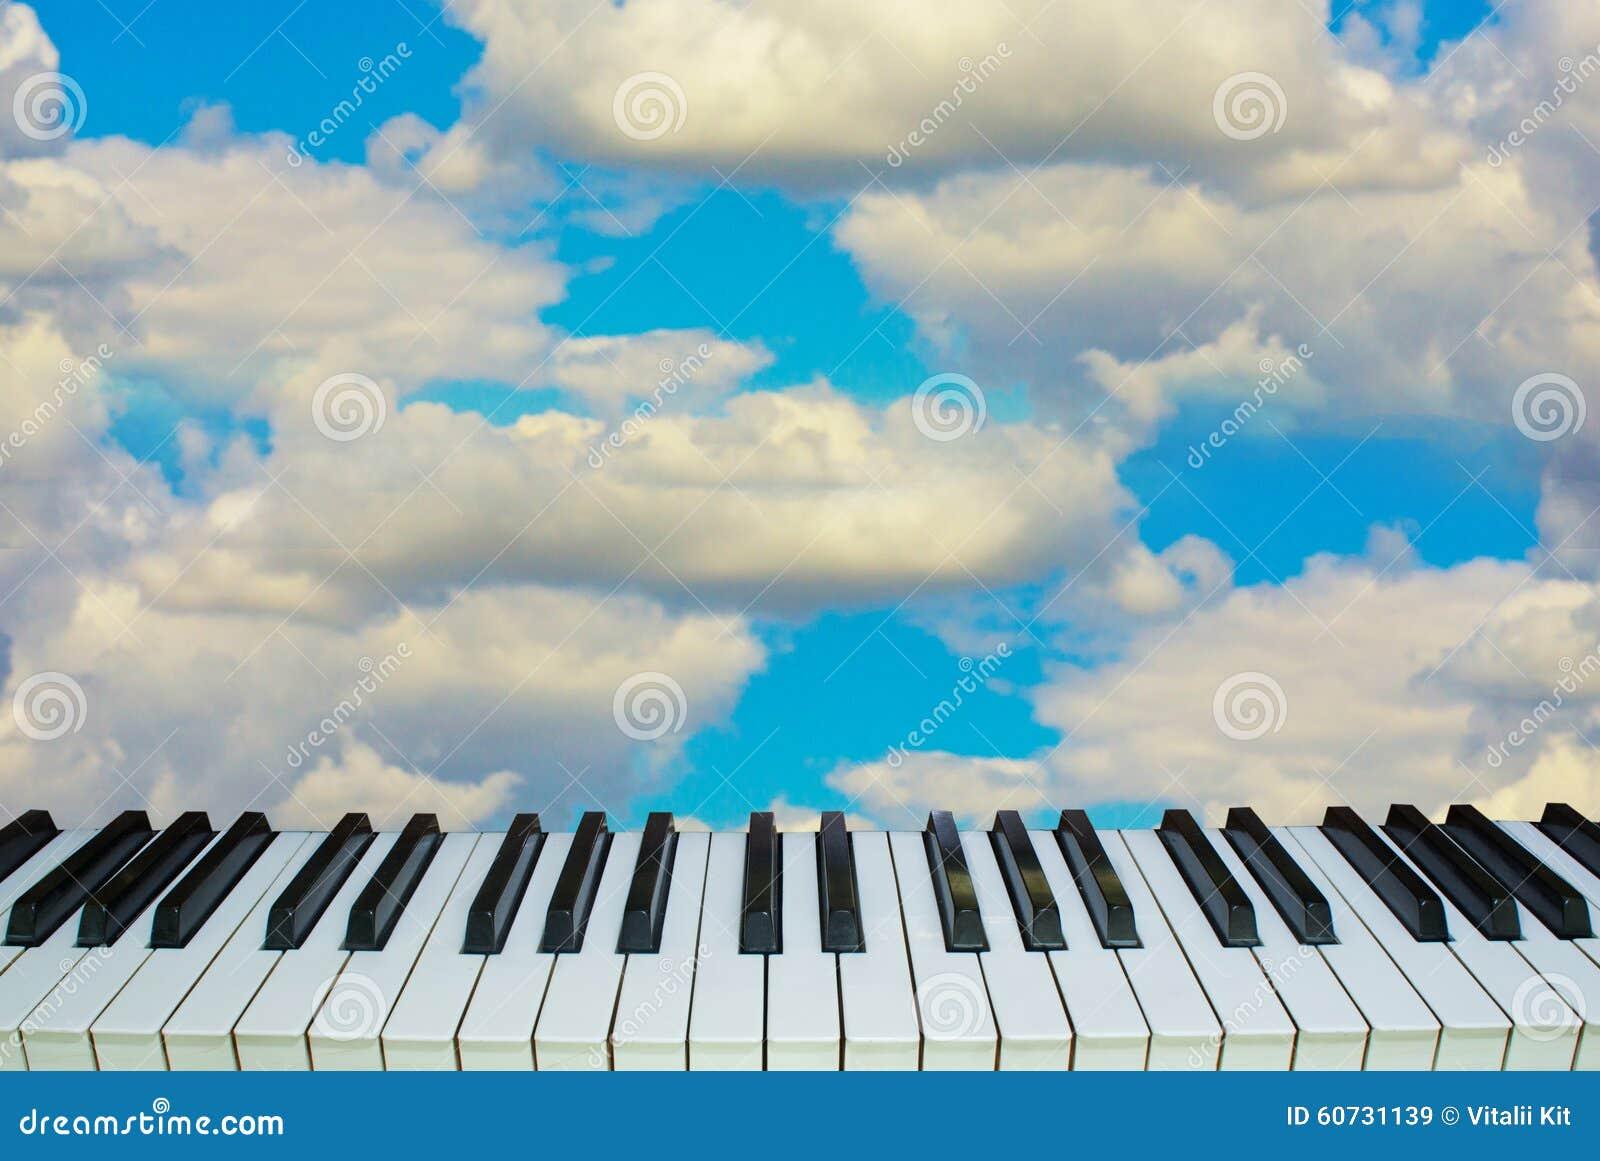 music heaven piano keys against the sky stock image image 60731139. Black Bedroom Furniture Sets. Home Design Ideas